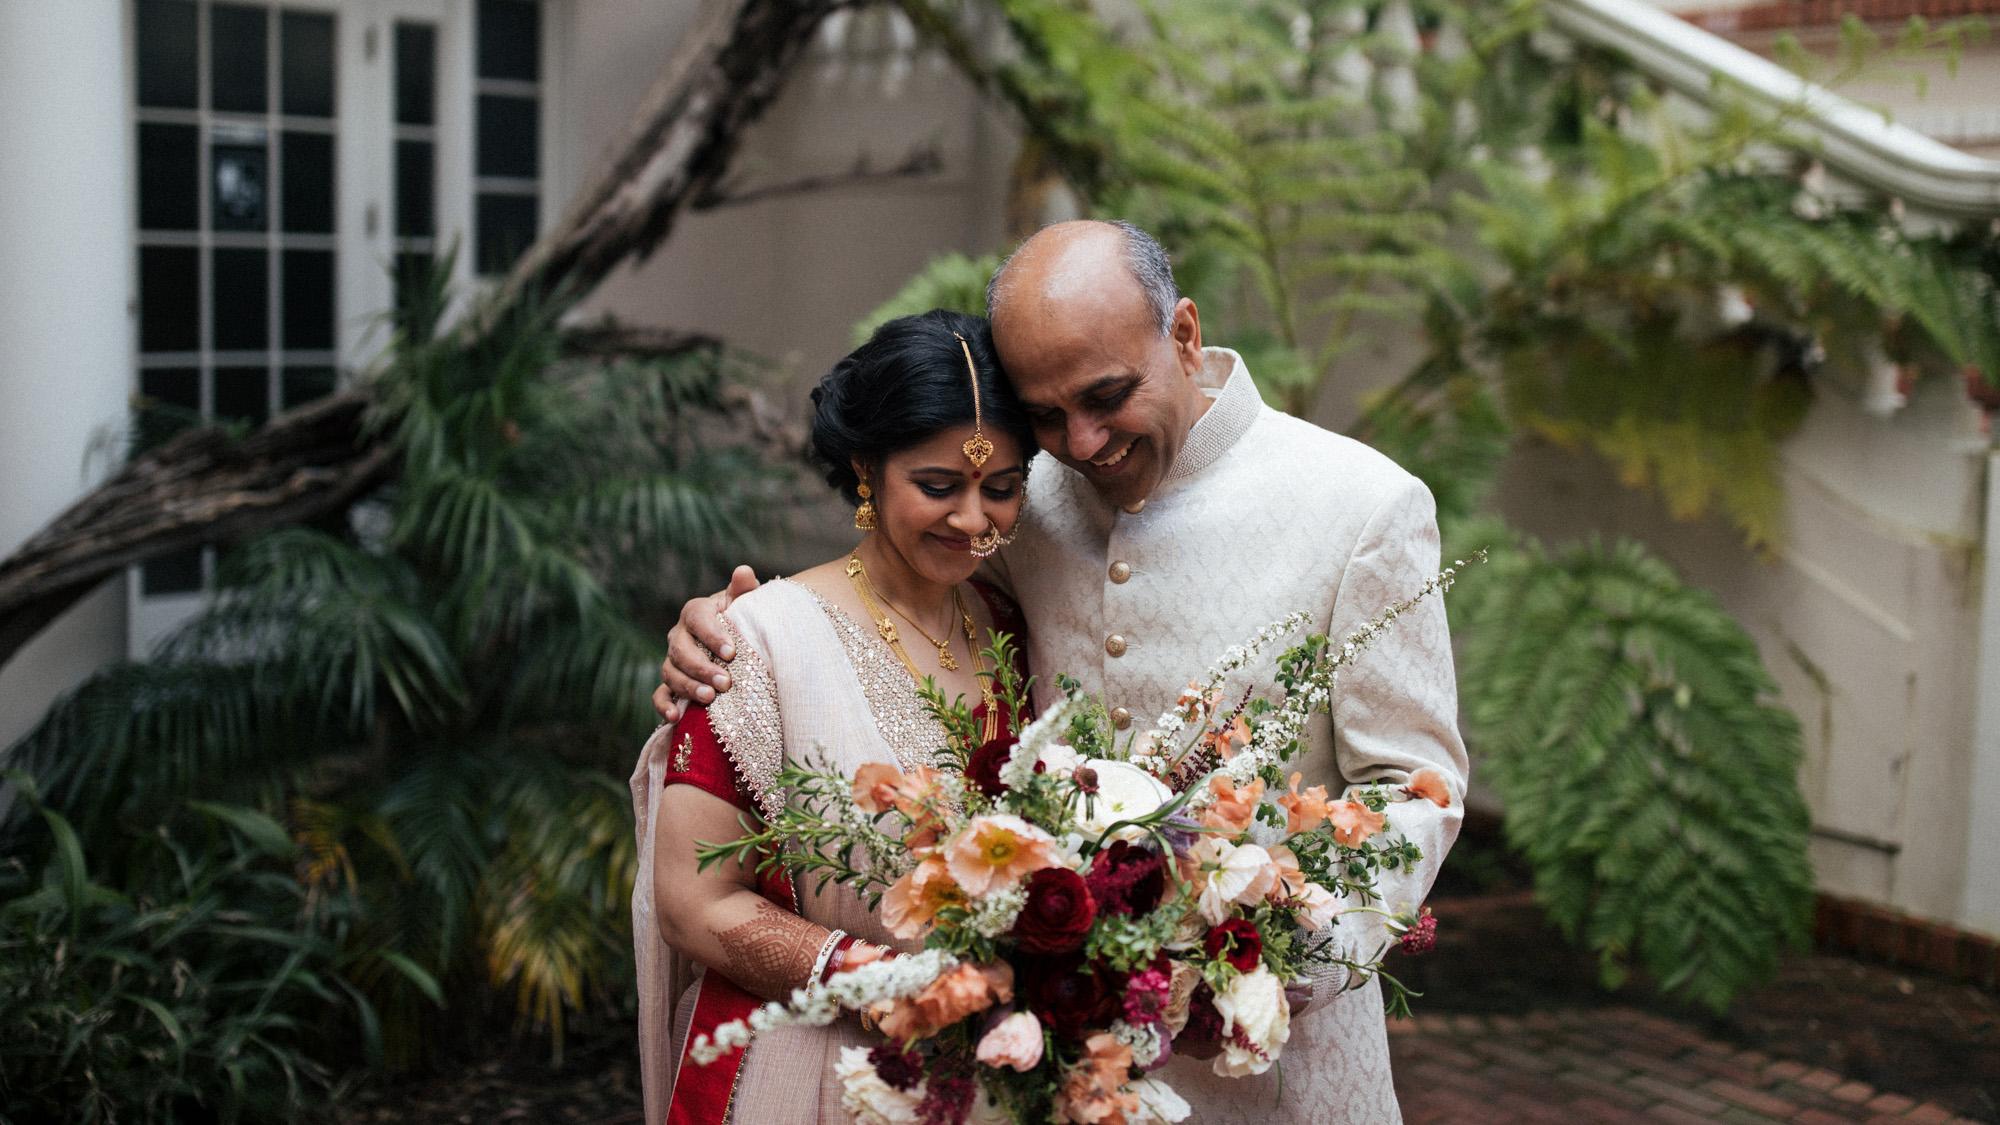 anu_maneesh_alec_vanderboom_Indian_wedding_photography-0061.jpg